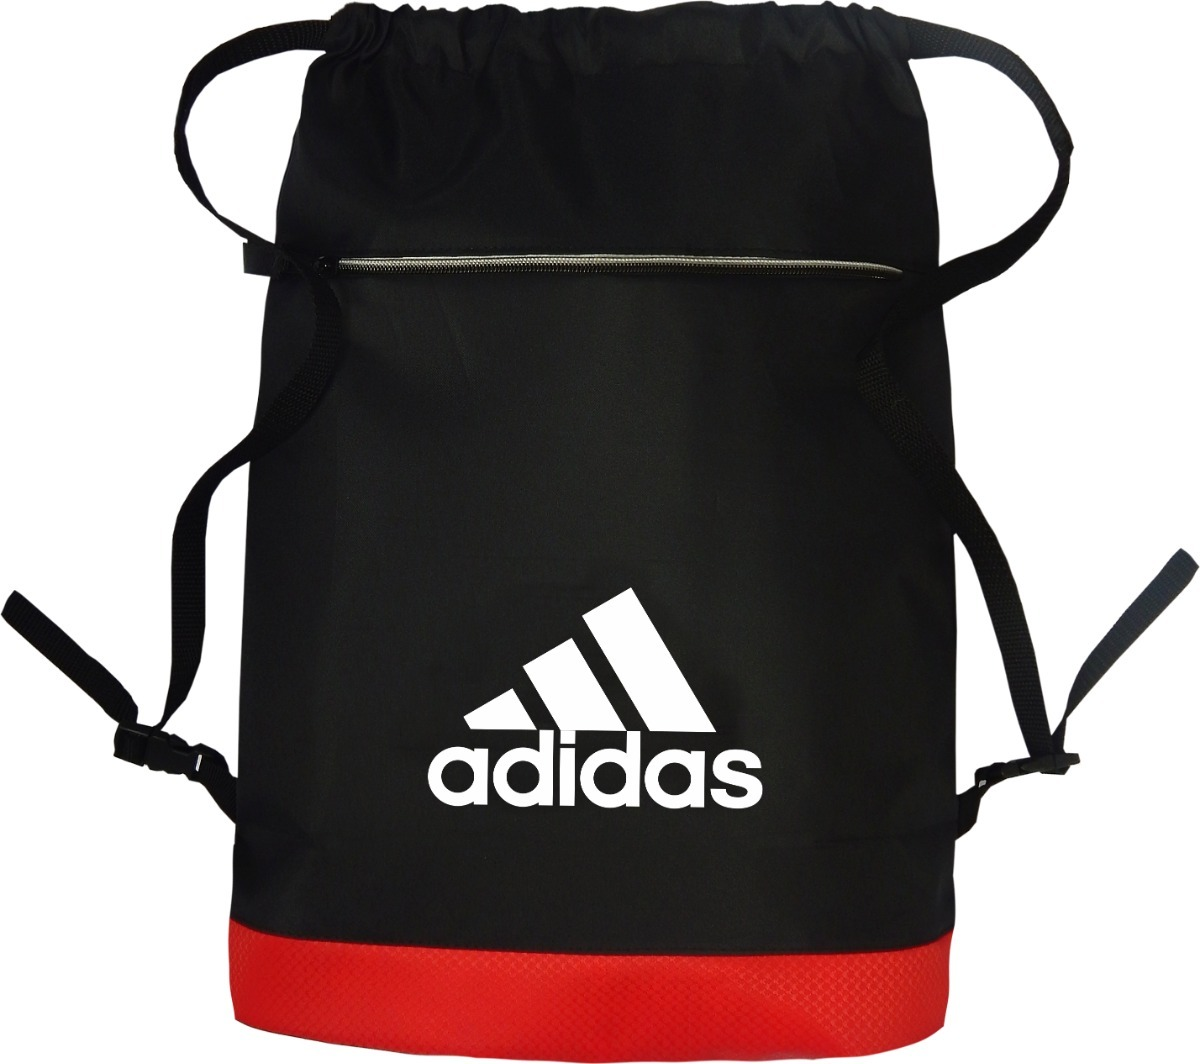 63c515bbd mochila bolsa saco academia futebol treino unissex. Carregando zoom.